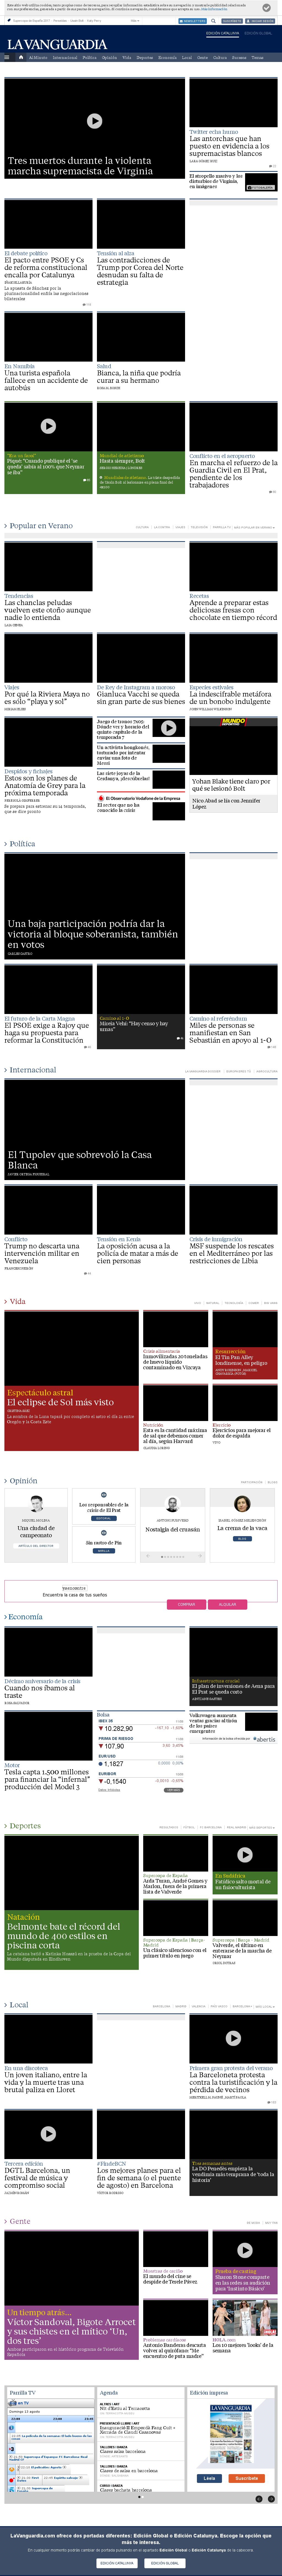 La Vanguardia at Sunday Aug. 13, 2017, 6:19 a.m. UTC